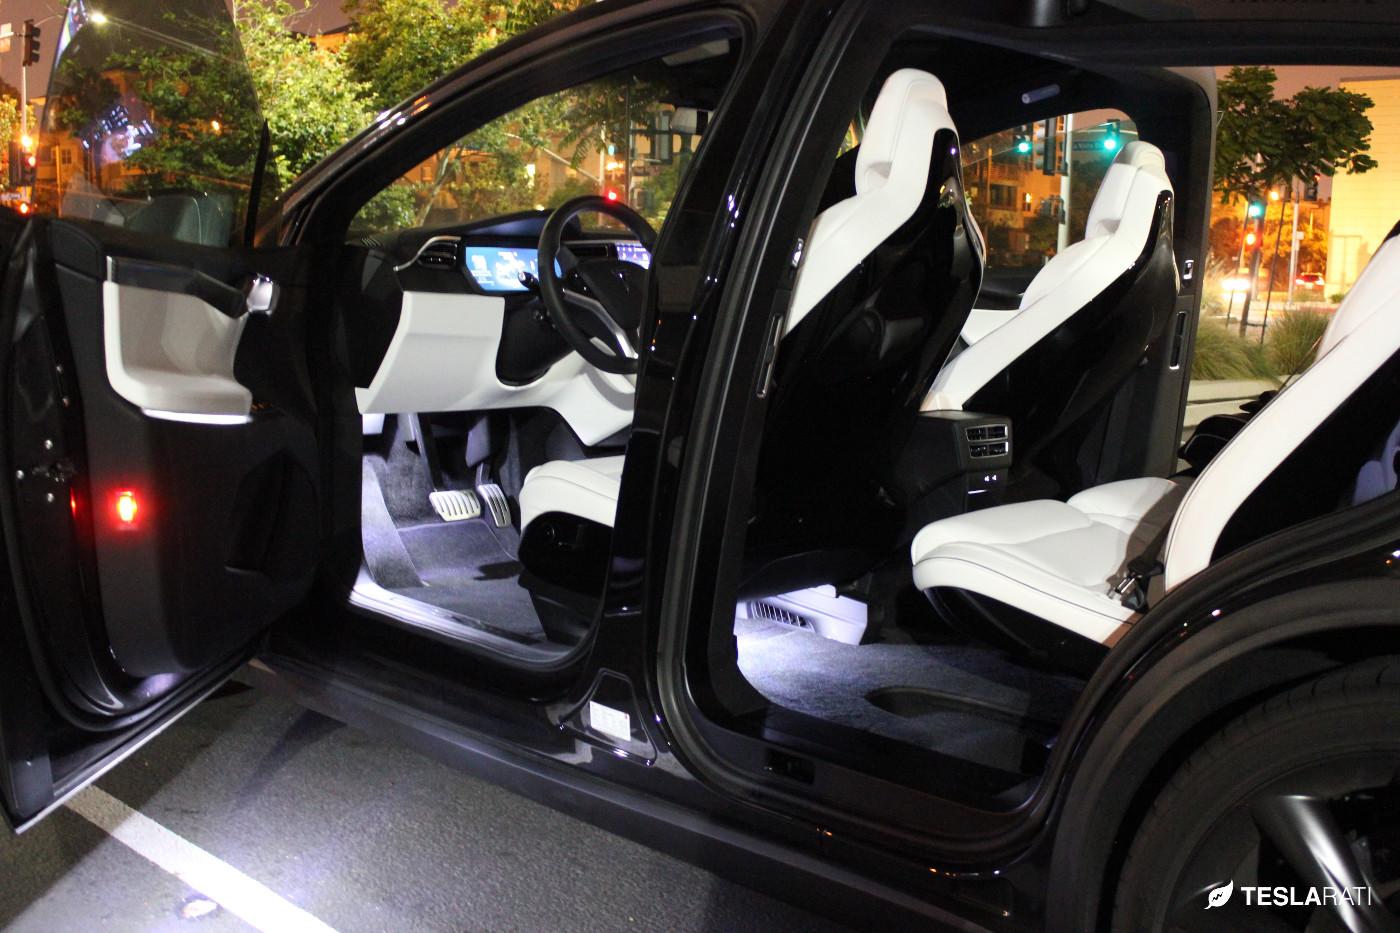 Upgrading Tesla Model X Lighting With Ultra Bright Leds